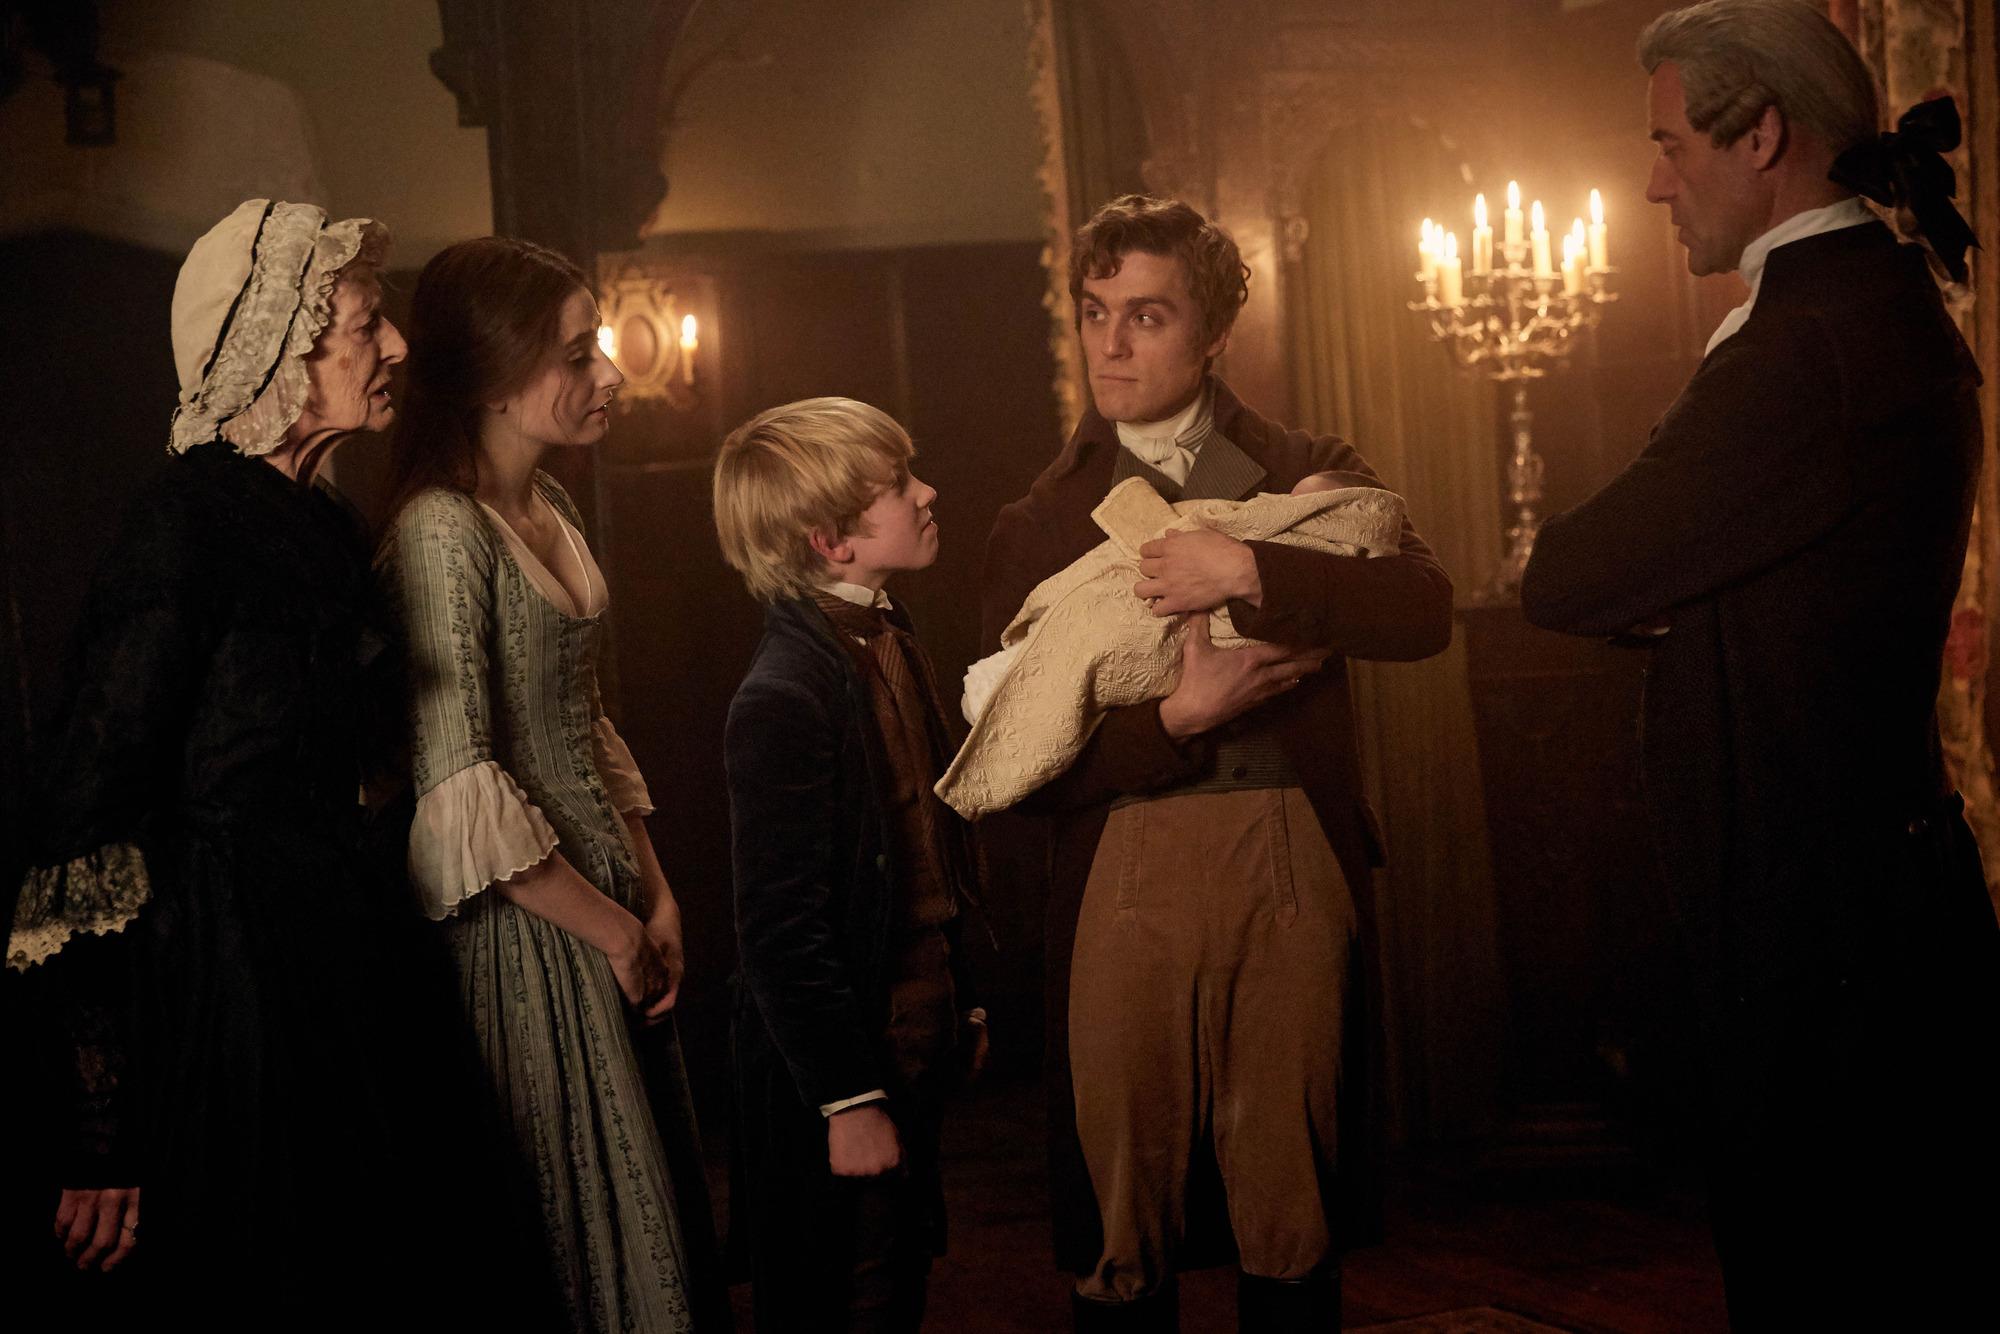 Aunt Agatha (CAROLINE BLAKISTON), Morwenna Chynoweth (ELLISE CHAPPELL), George Warleggan (JACK FARTHING) - (C) Mammoth Screen - Photographer: Robert Viglasky